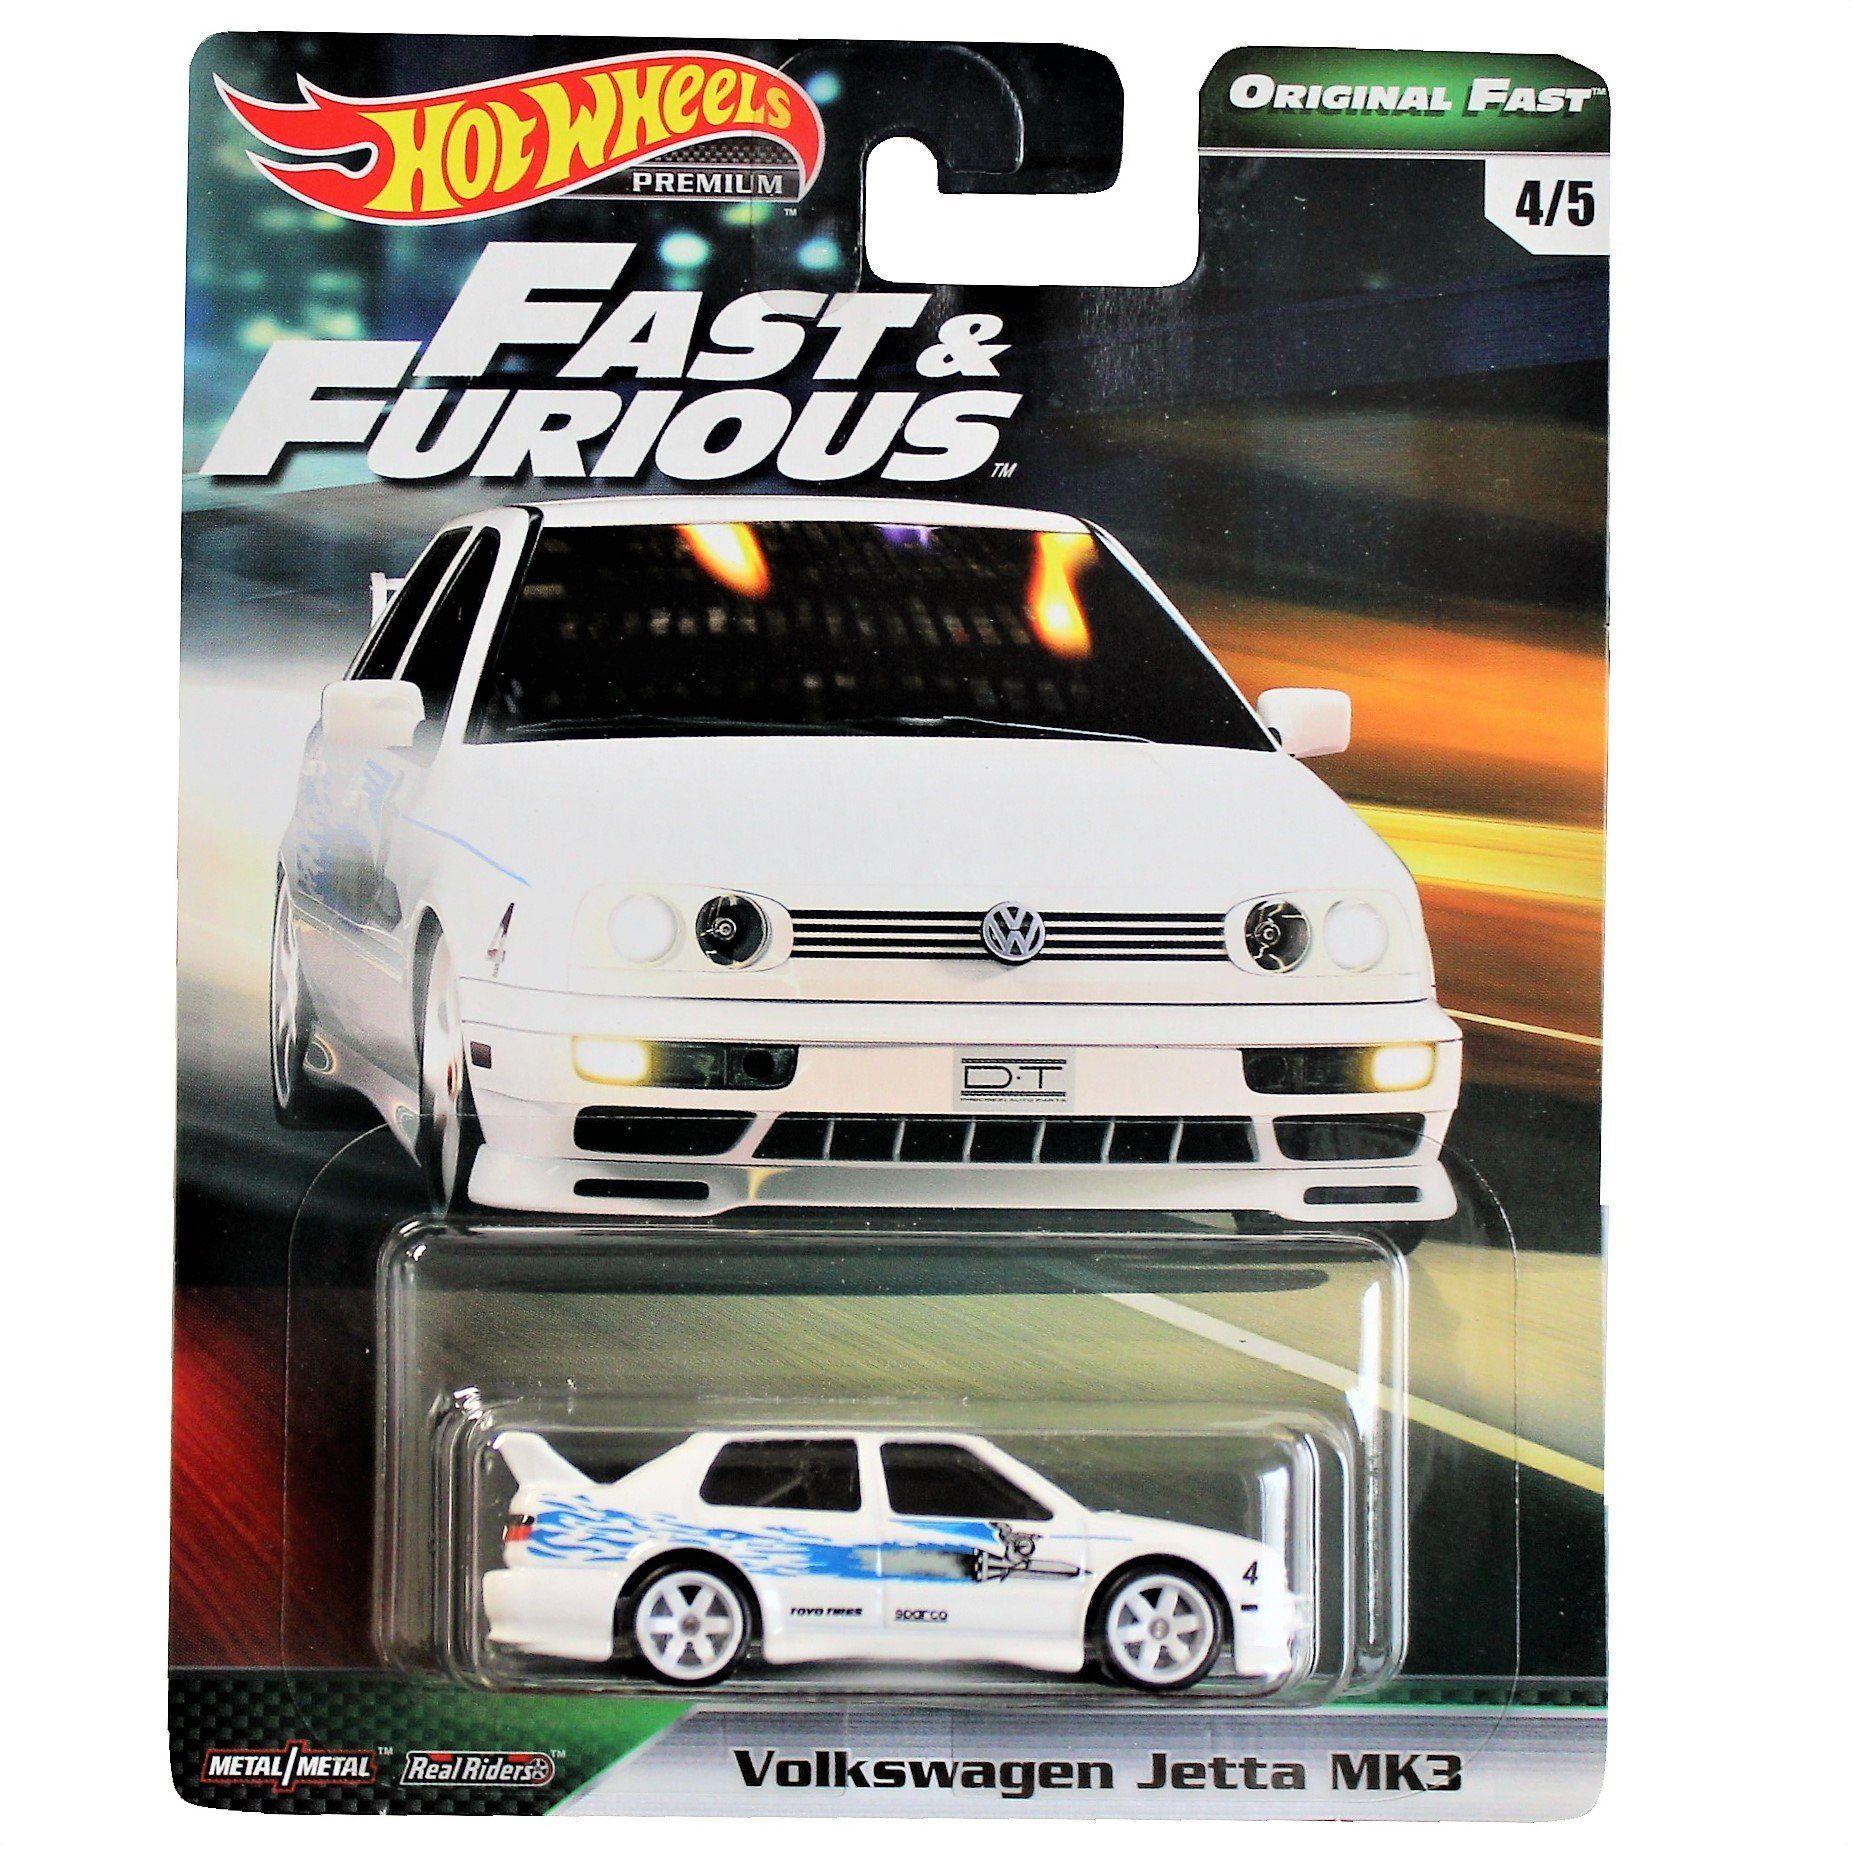 Hot Wheels Fast And Furious Premium Original Fast